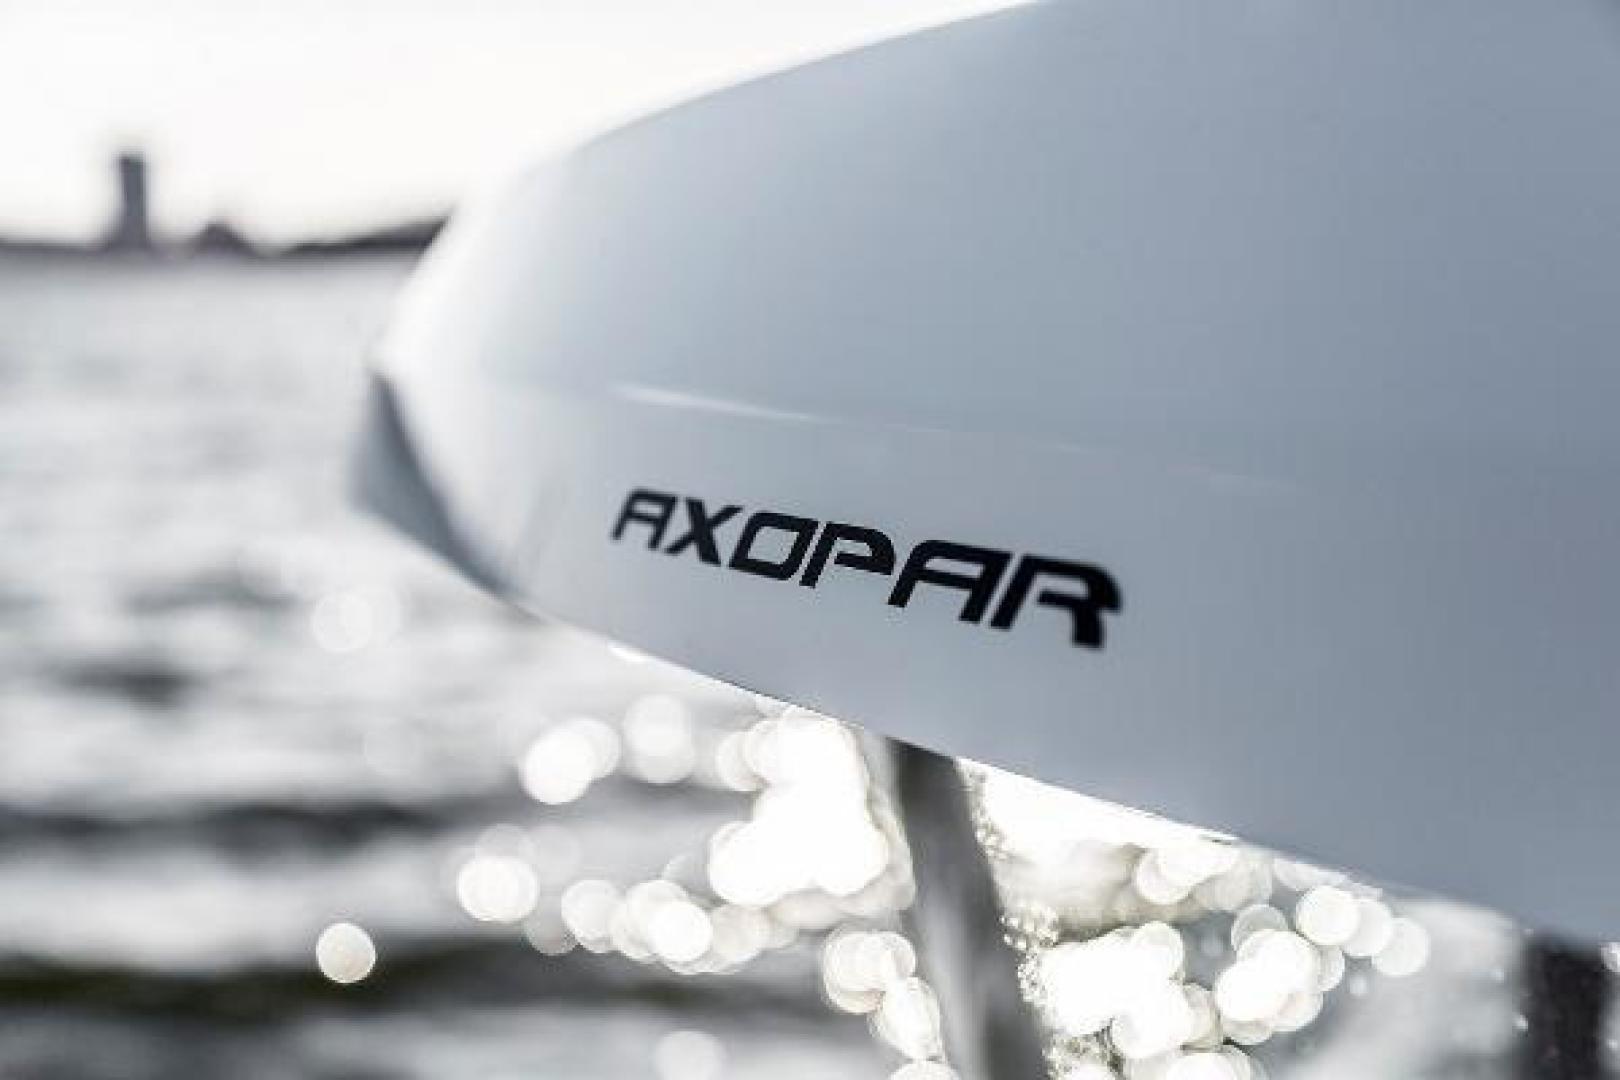 Axopar-28 CABIN 2020-Axopar 28 CABIN Fort Lauderdale-Florida-United States-1531318 | Thumbnail